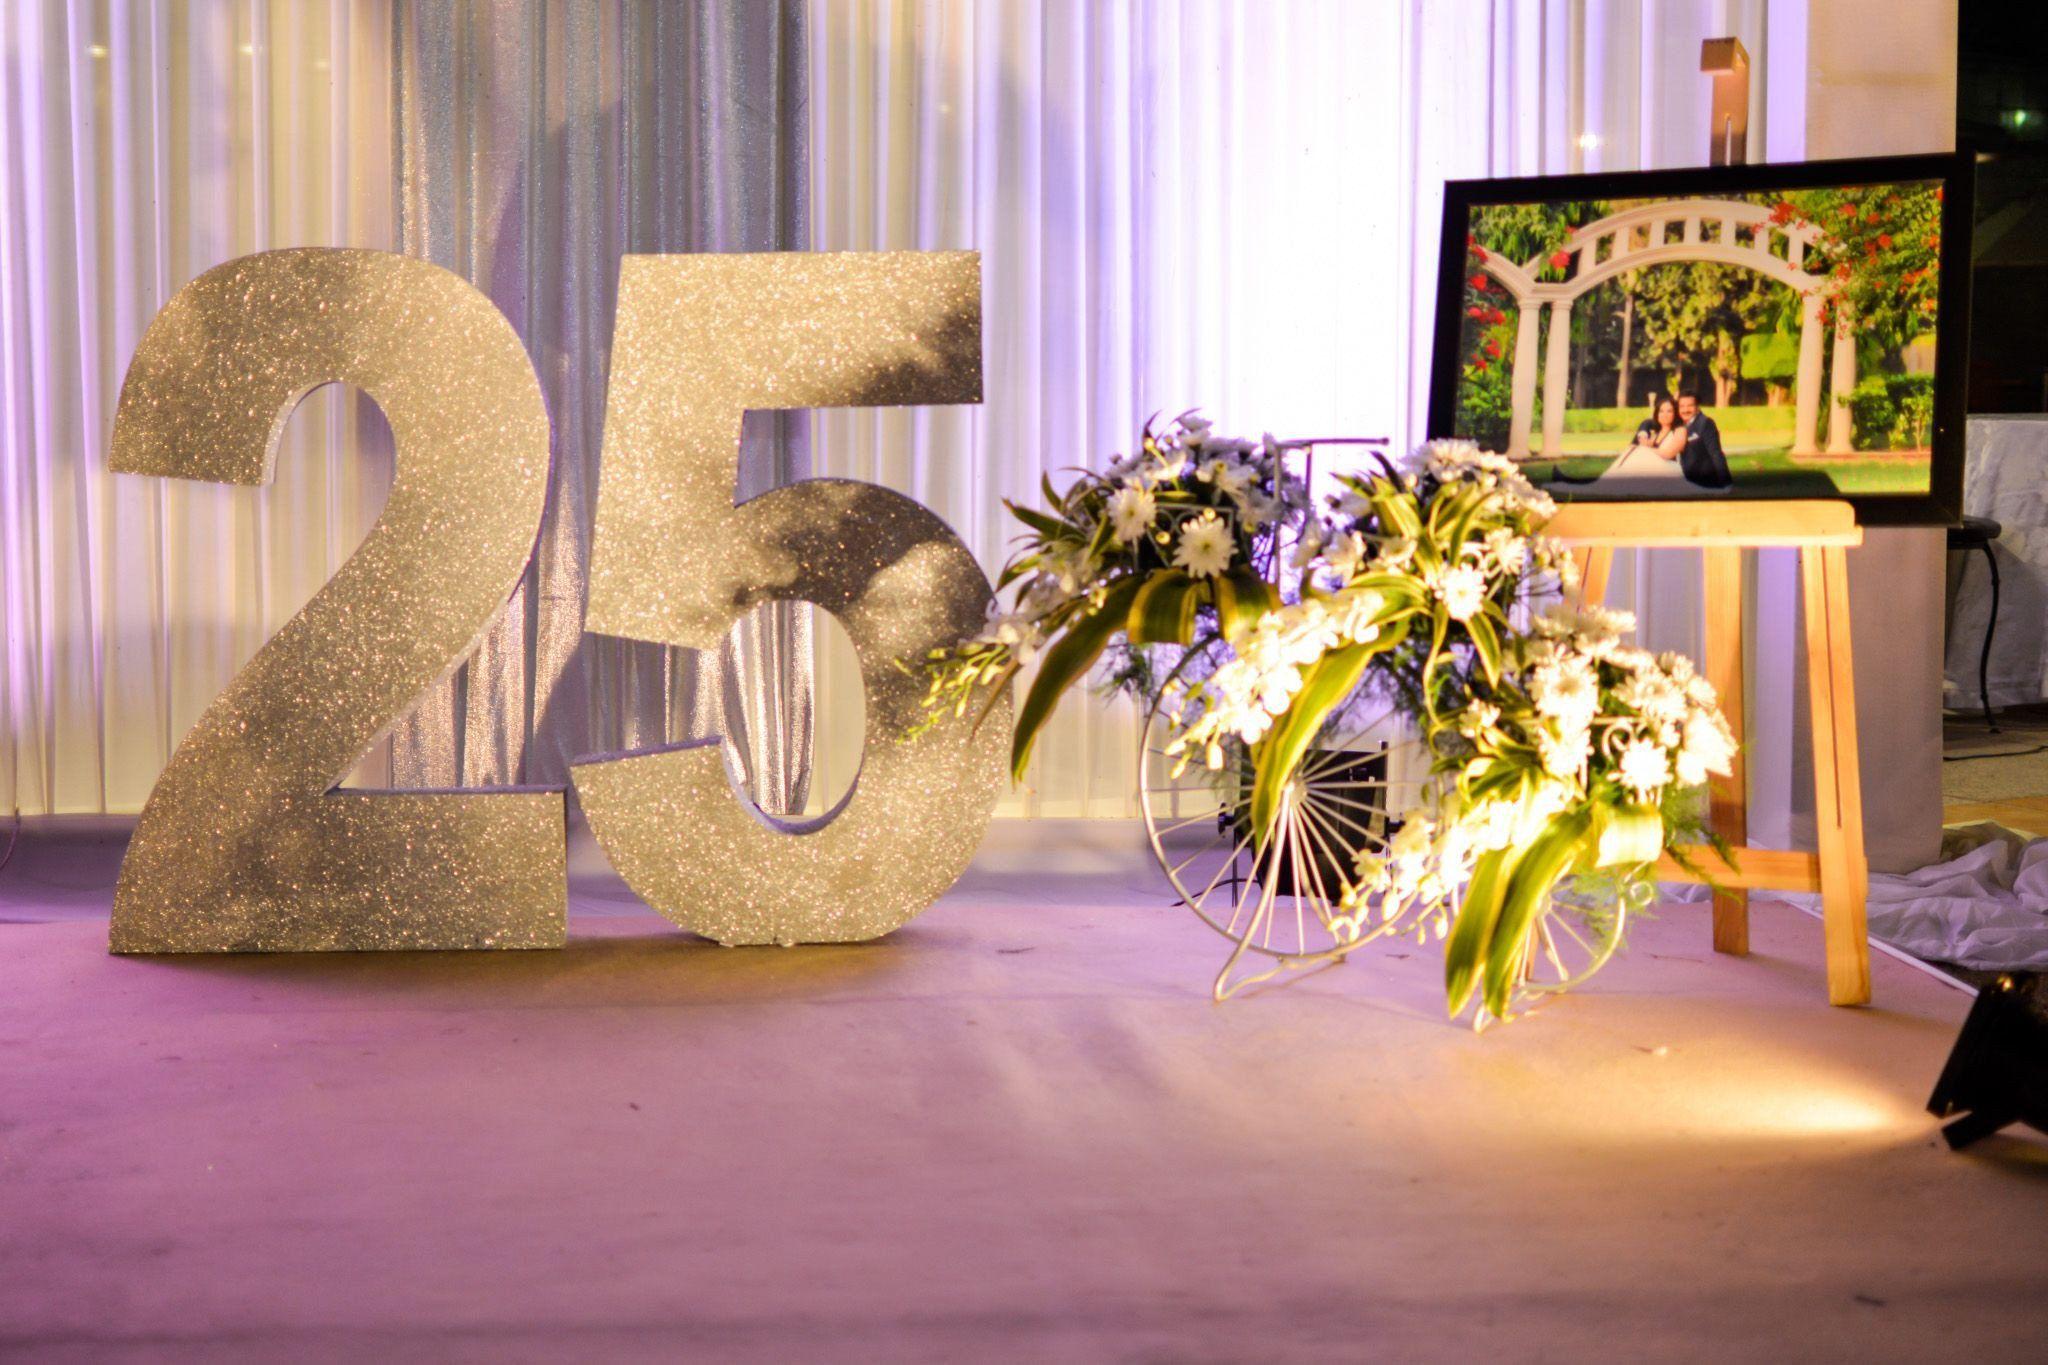 25th Anniversary Decoration Ideas Fresh Anniversary Decoratio